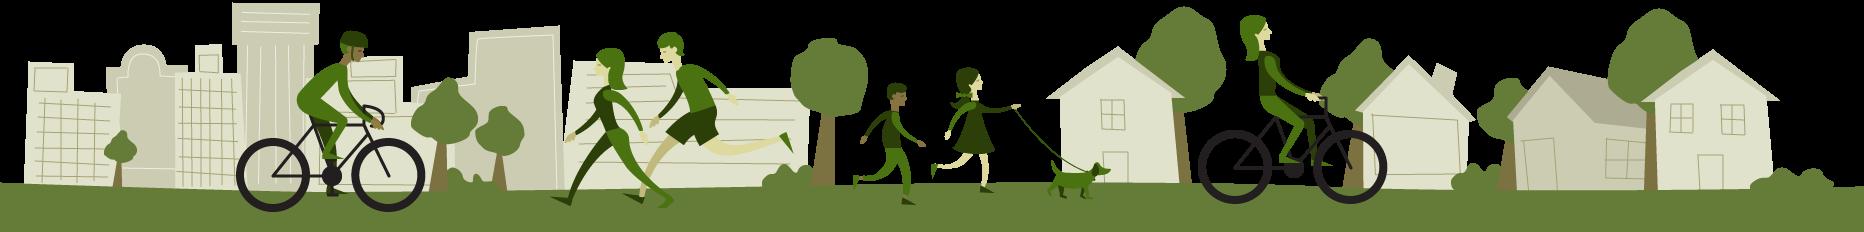 ozark-greenways-topper